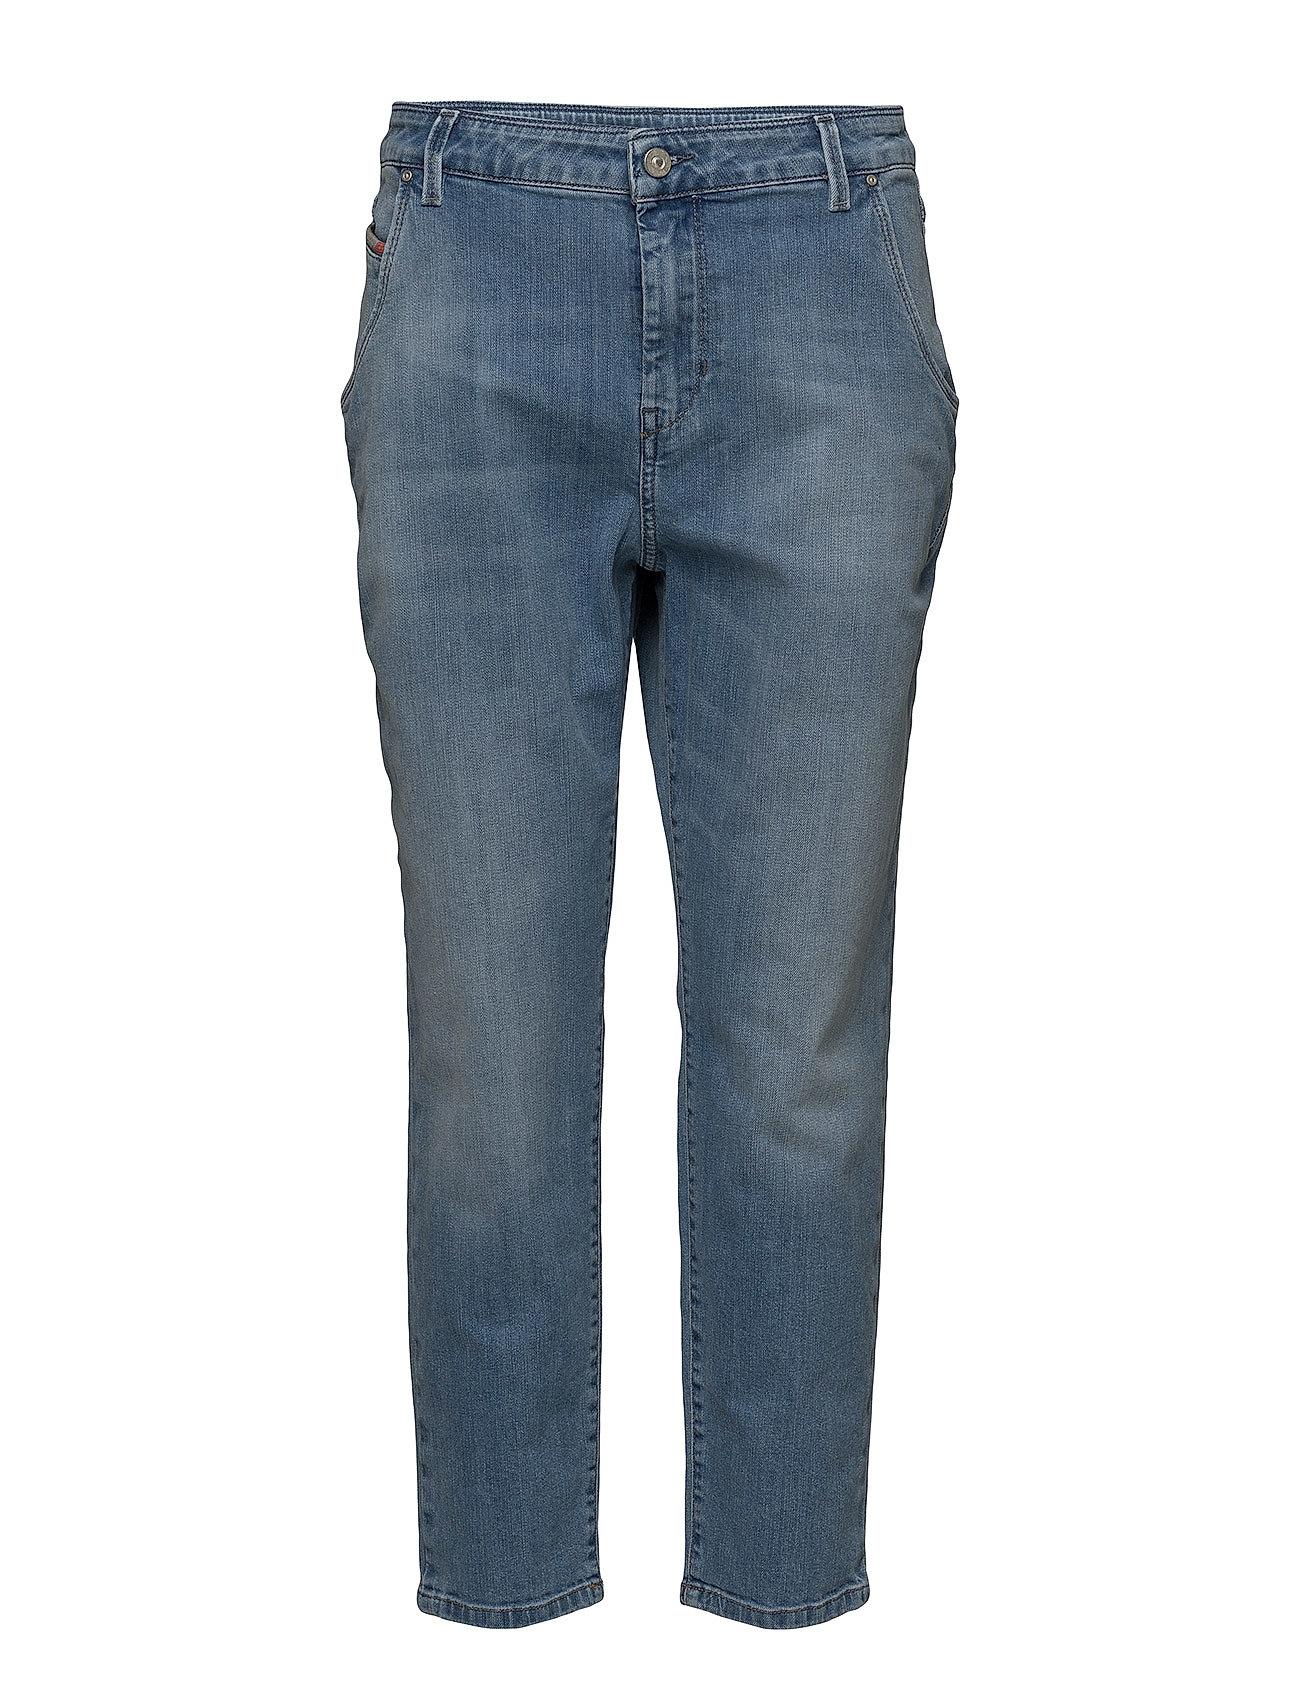 c3a89246 Fayza-evo Trousers (Denim) (£90) - Diesel Women - Jeans | Boozt.com